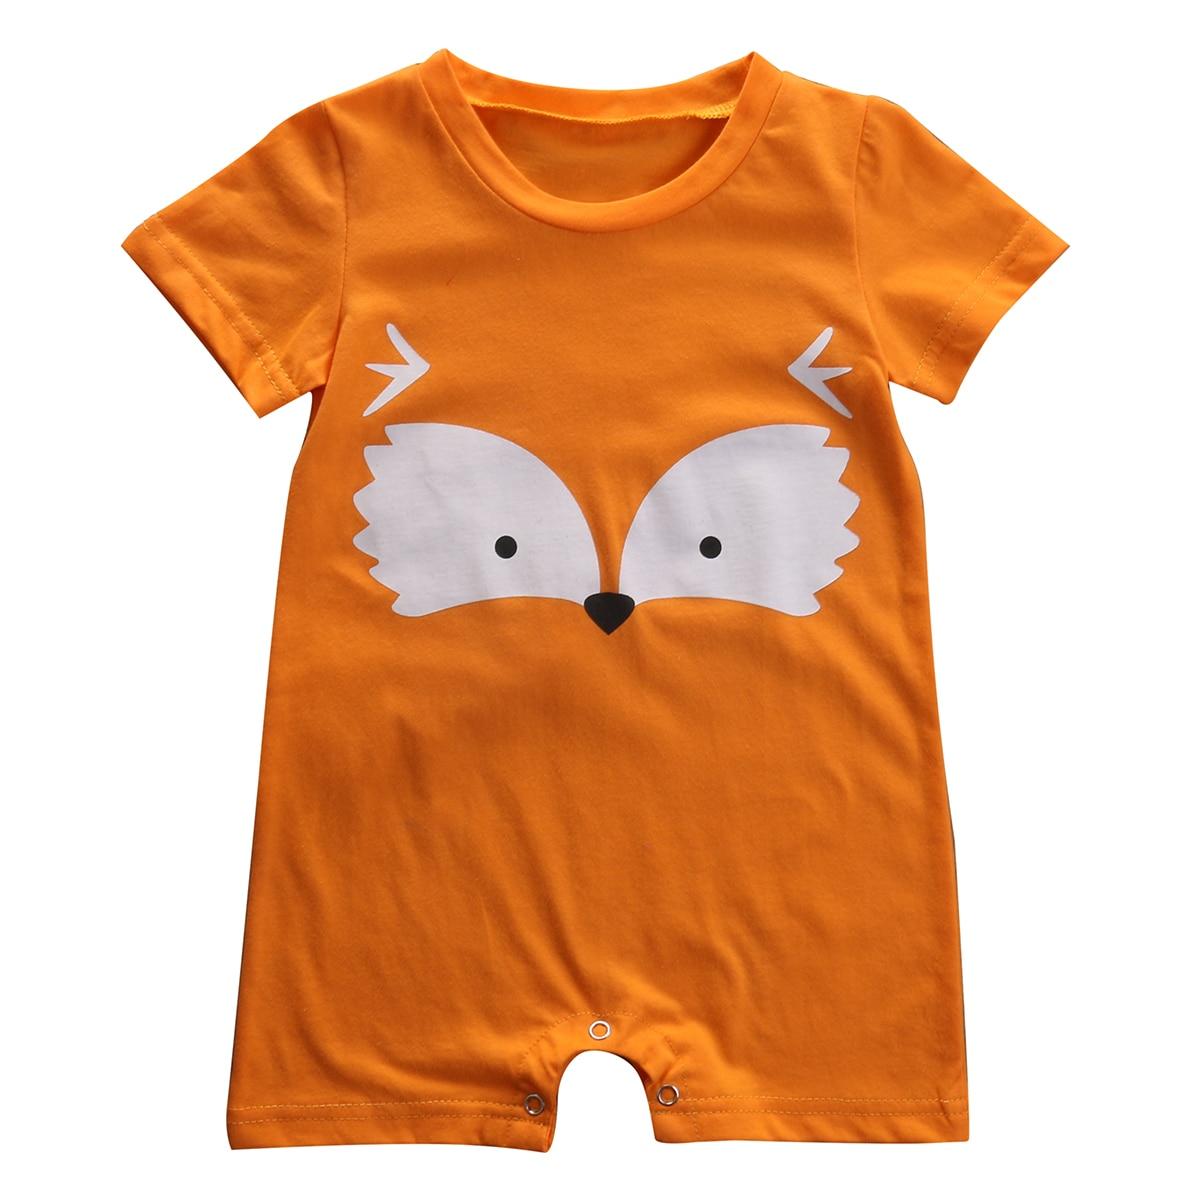 Cute Newborn Baby Boy Fox Romper Short Sleeve Jumpsuit